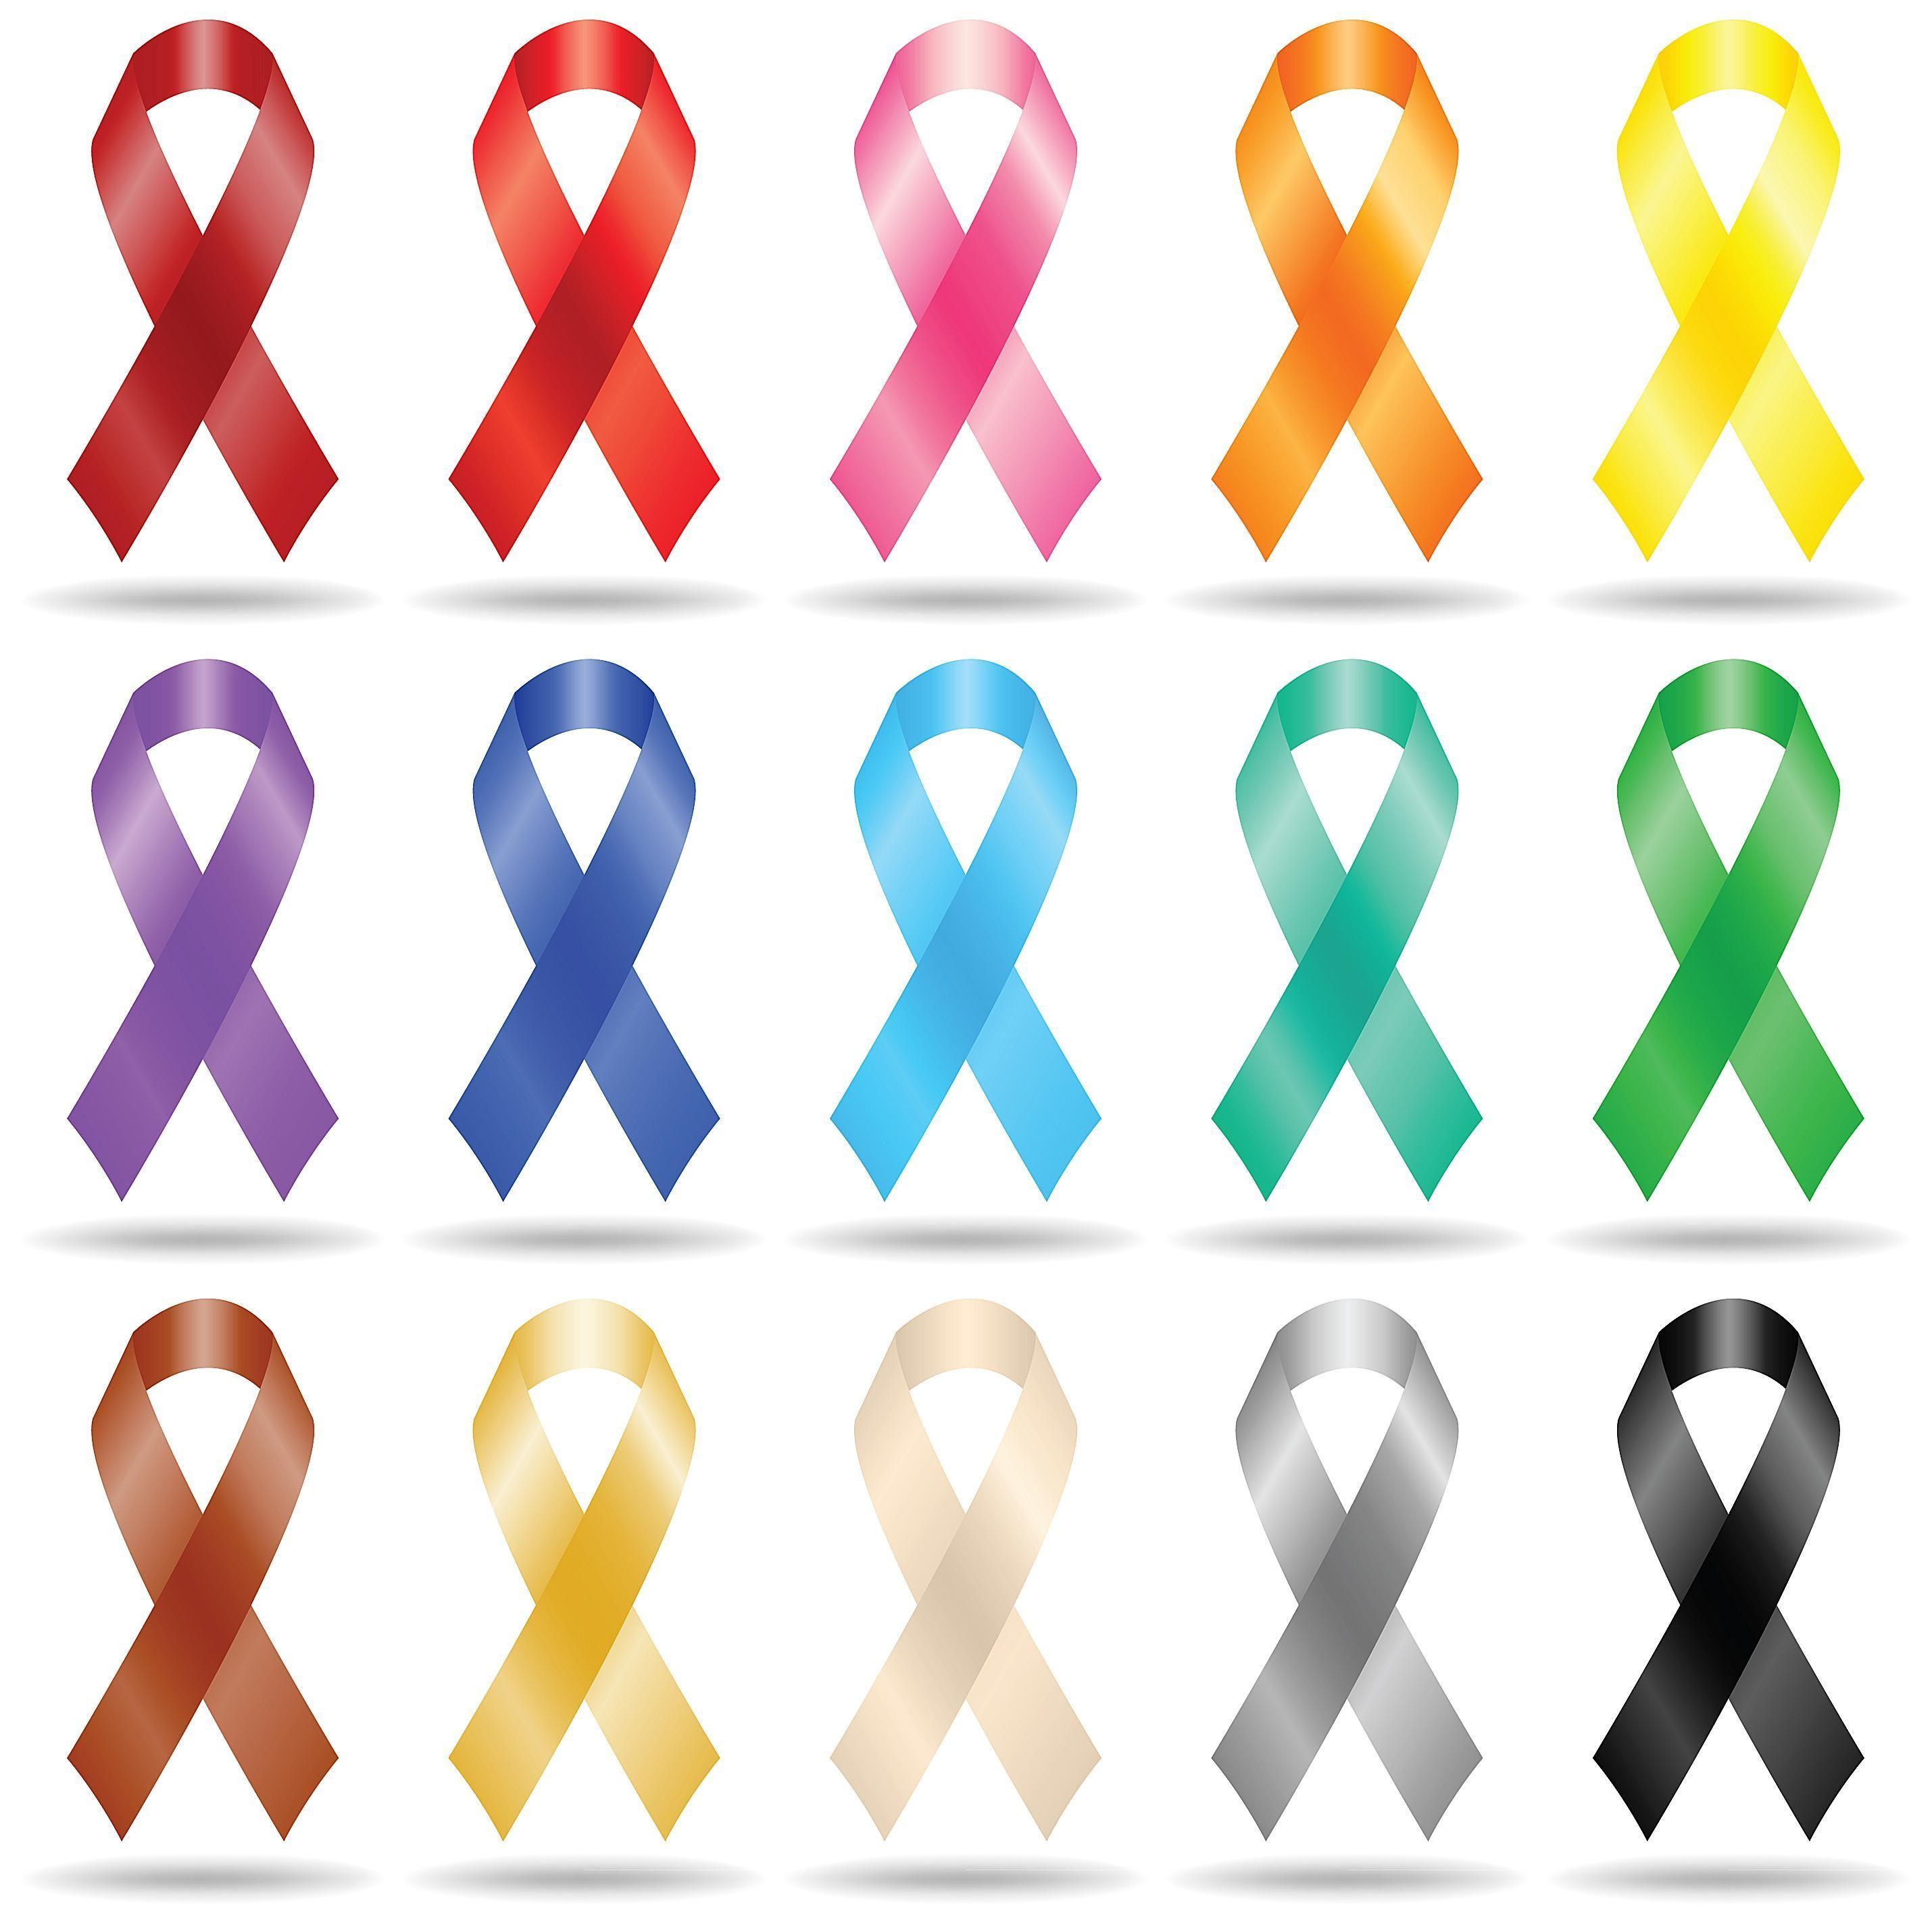 Cancer clipart brain cancer. Ribbon nice design orange